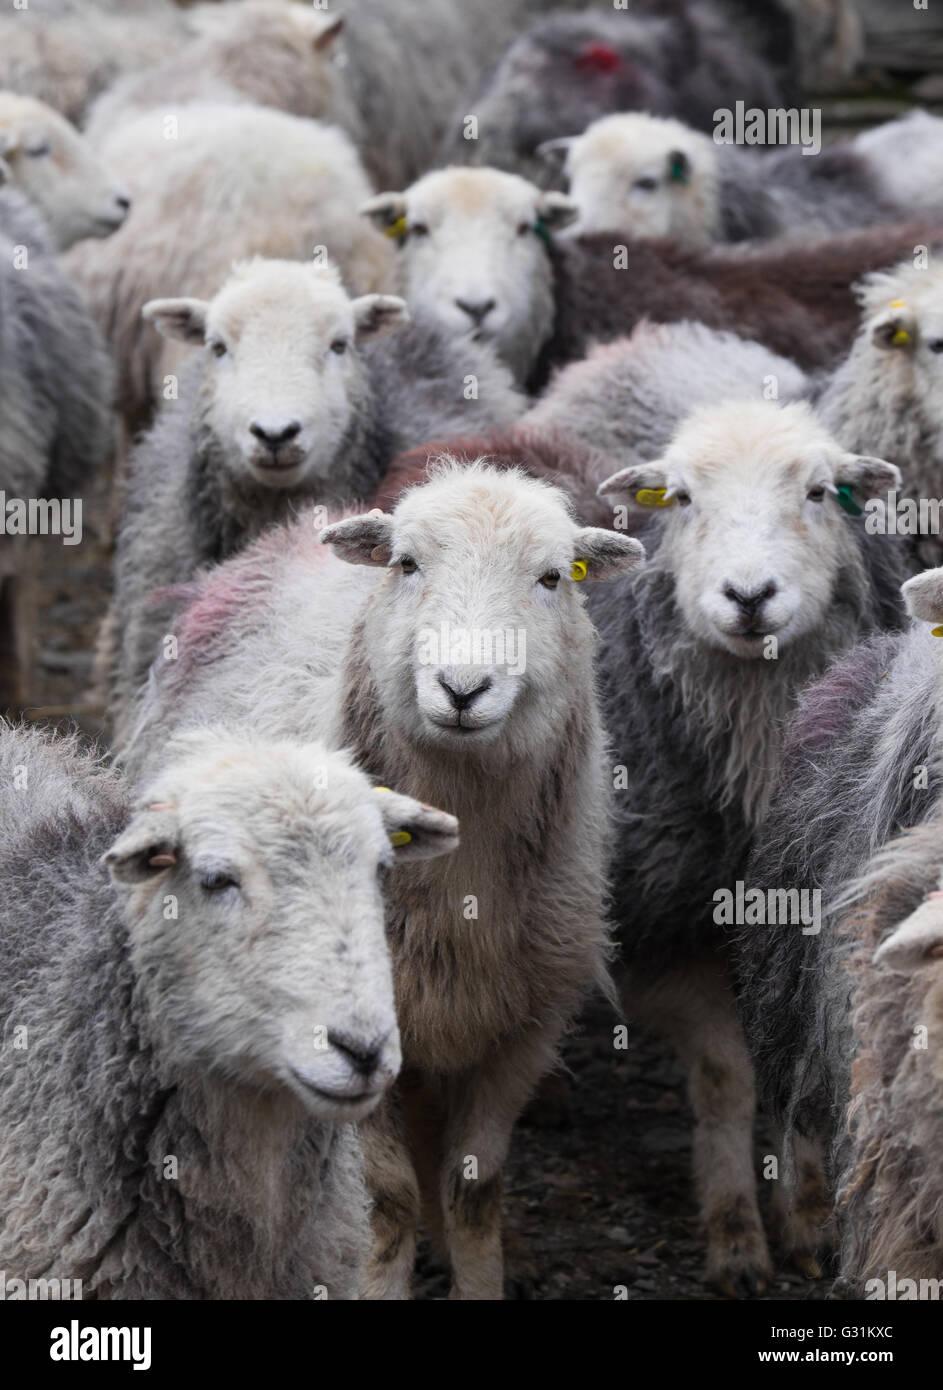 Herdwick ewes gathered in the farmyard - Stock Image